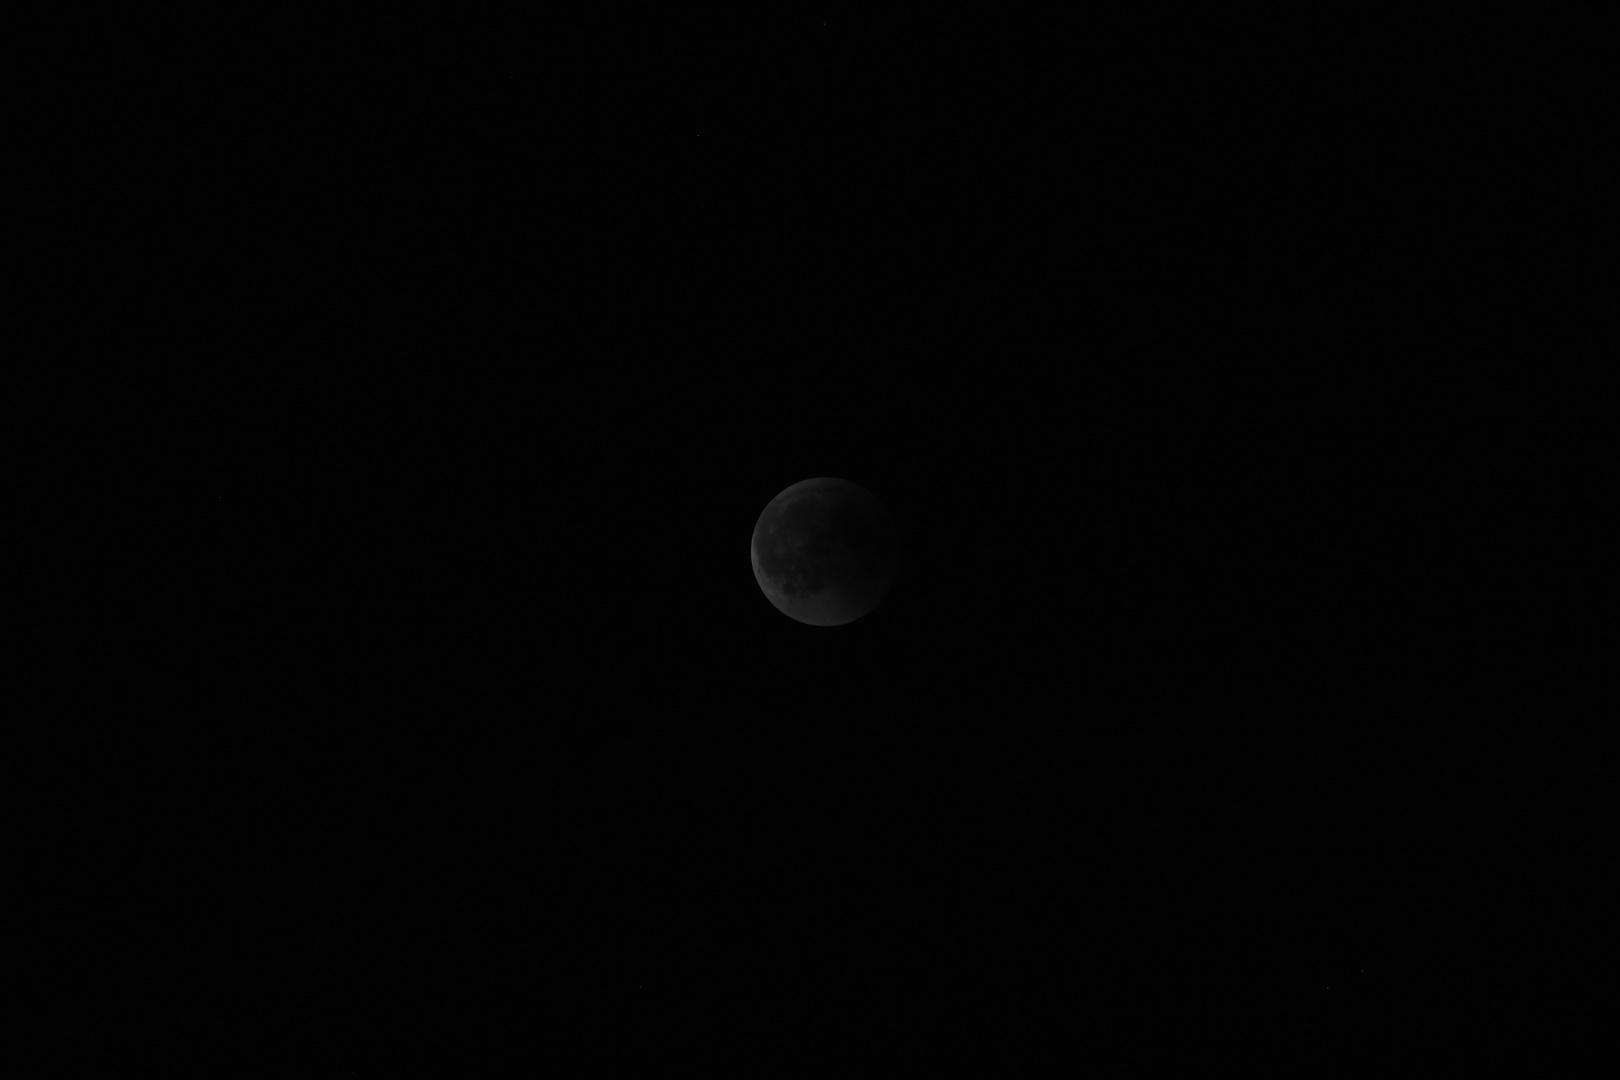 Eternal moon